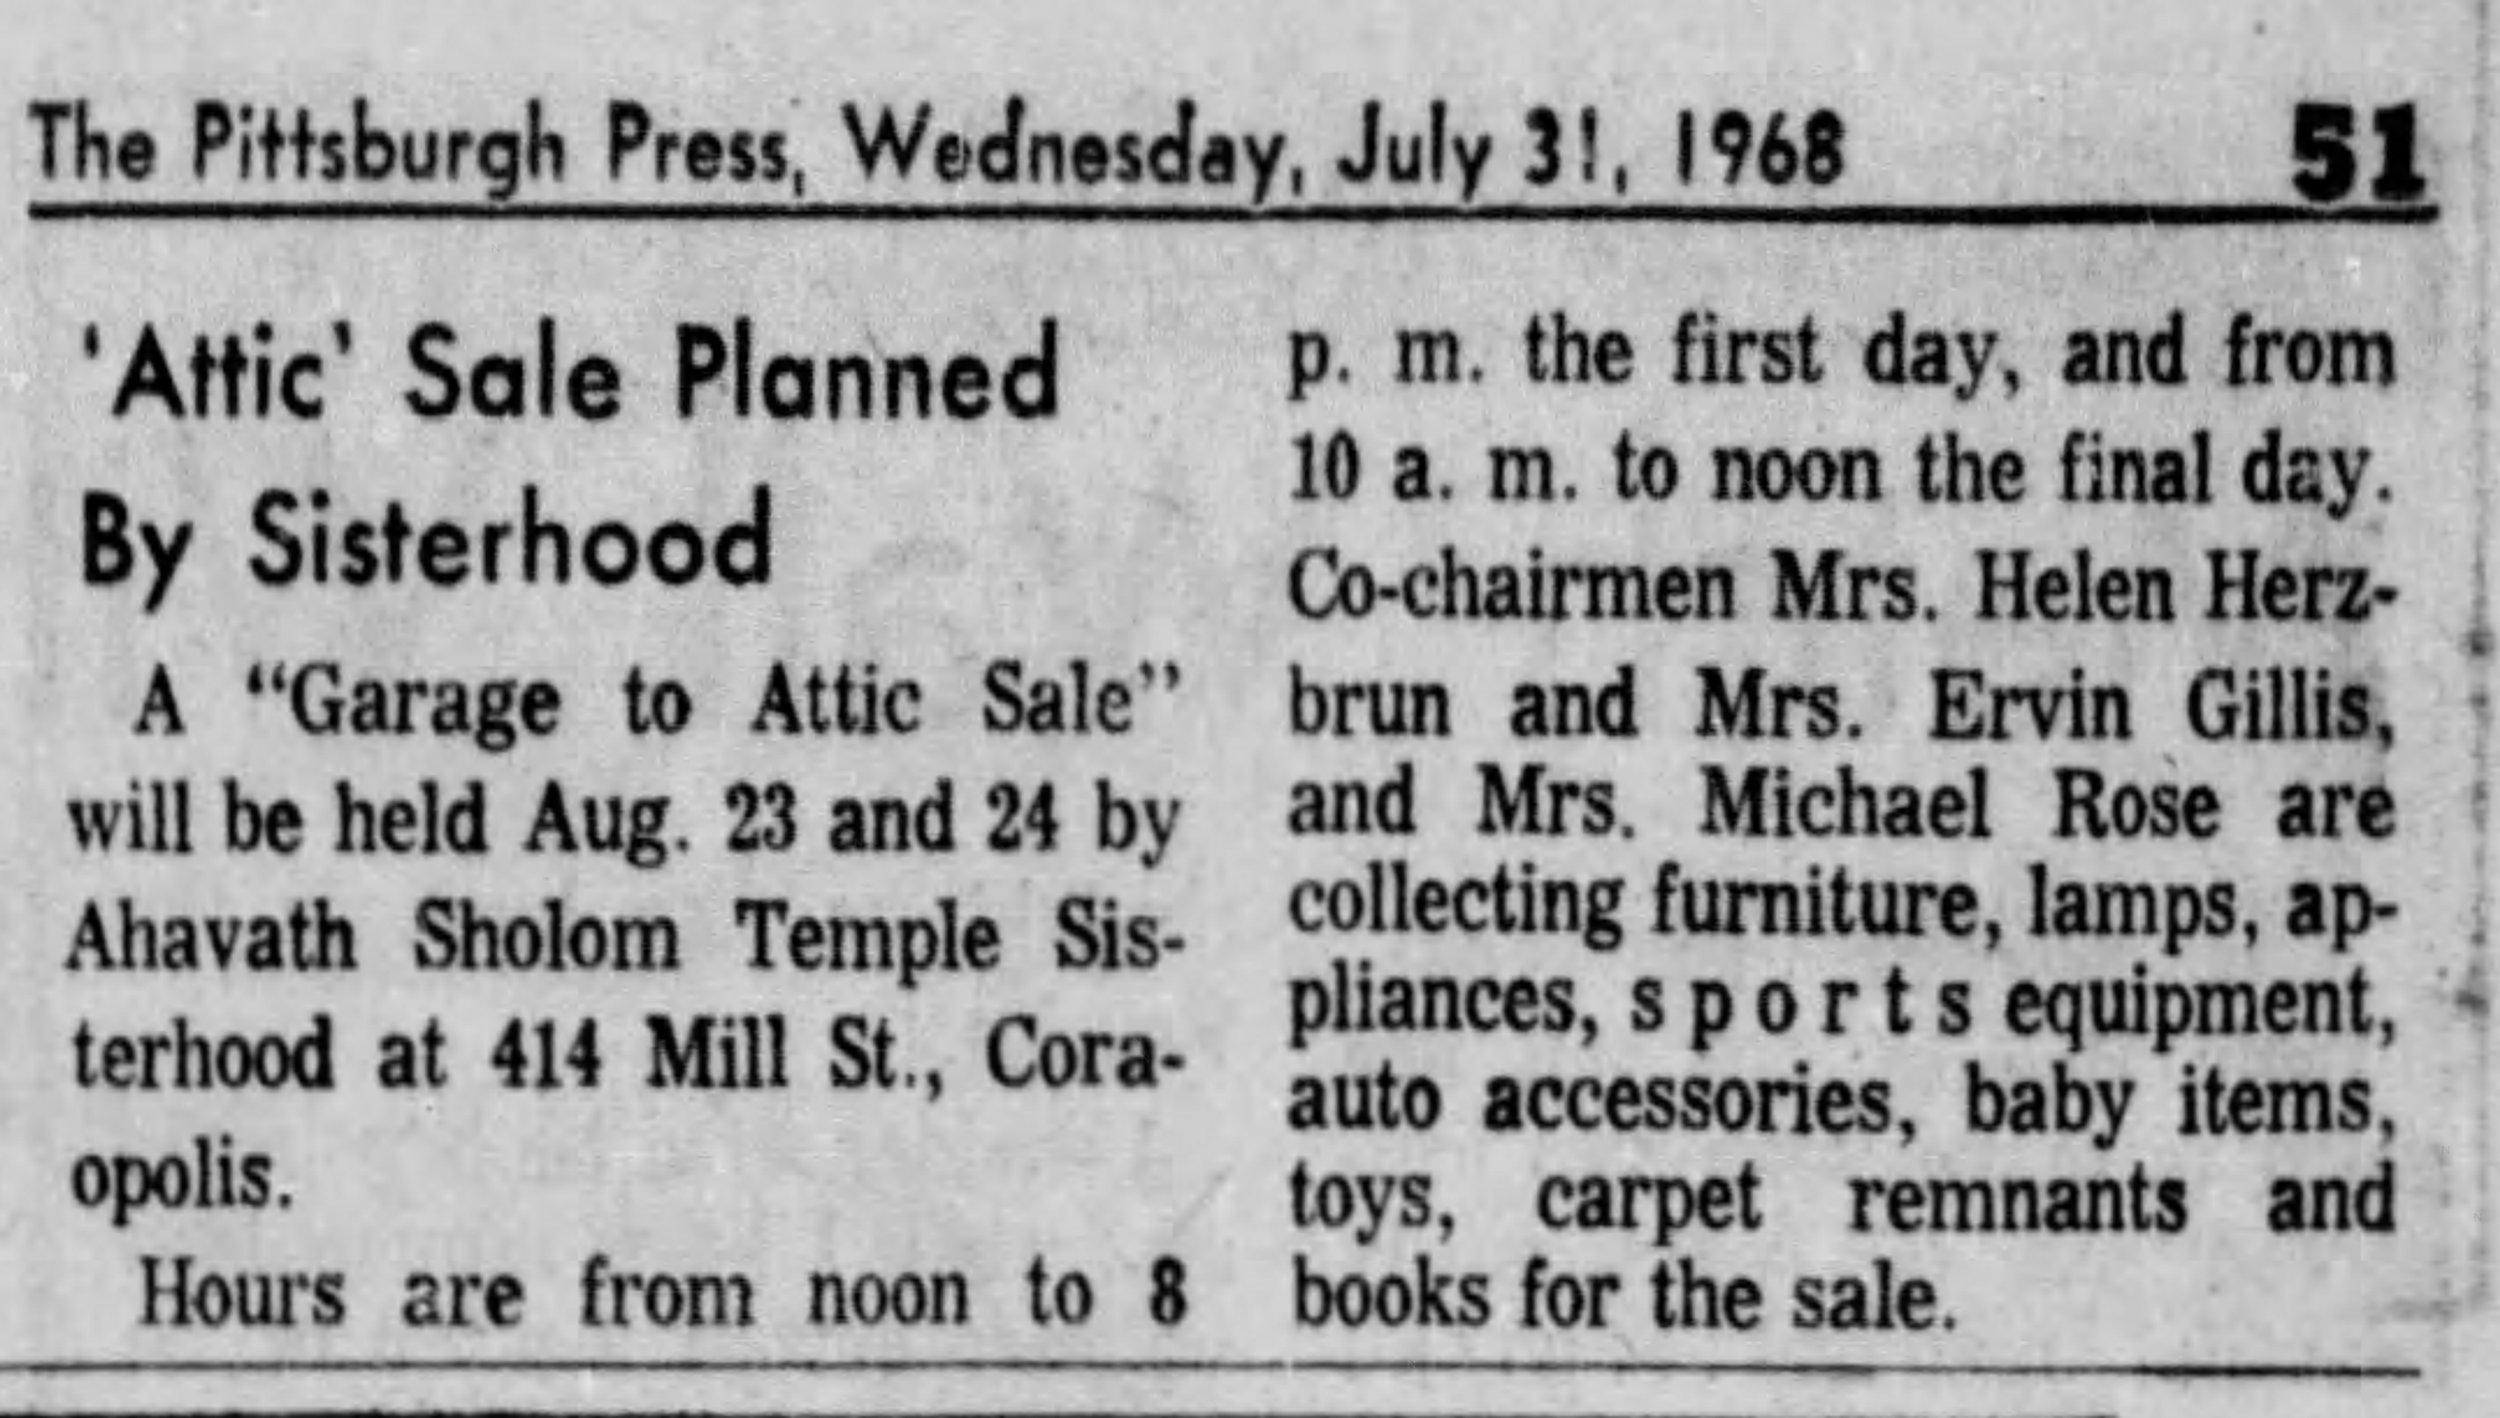 1968-07-31 The Pittsburgh Press (v85, n37, p51)